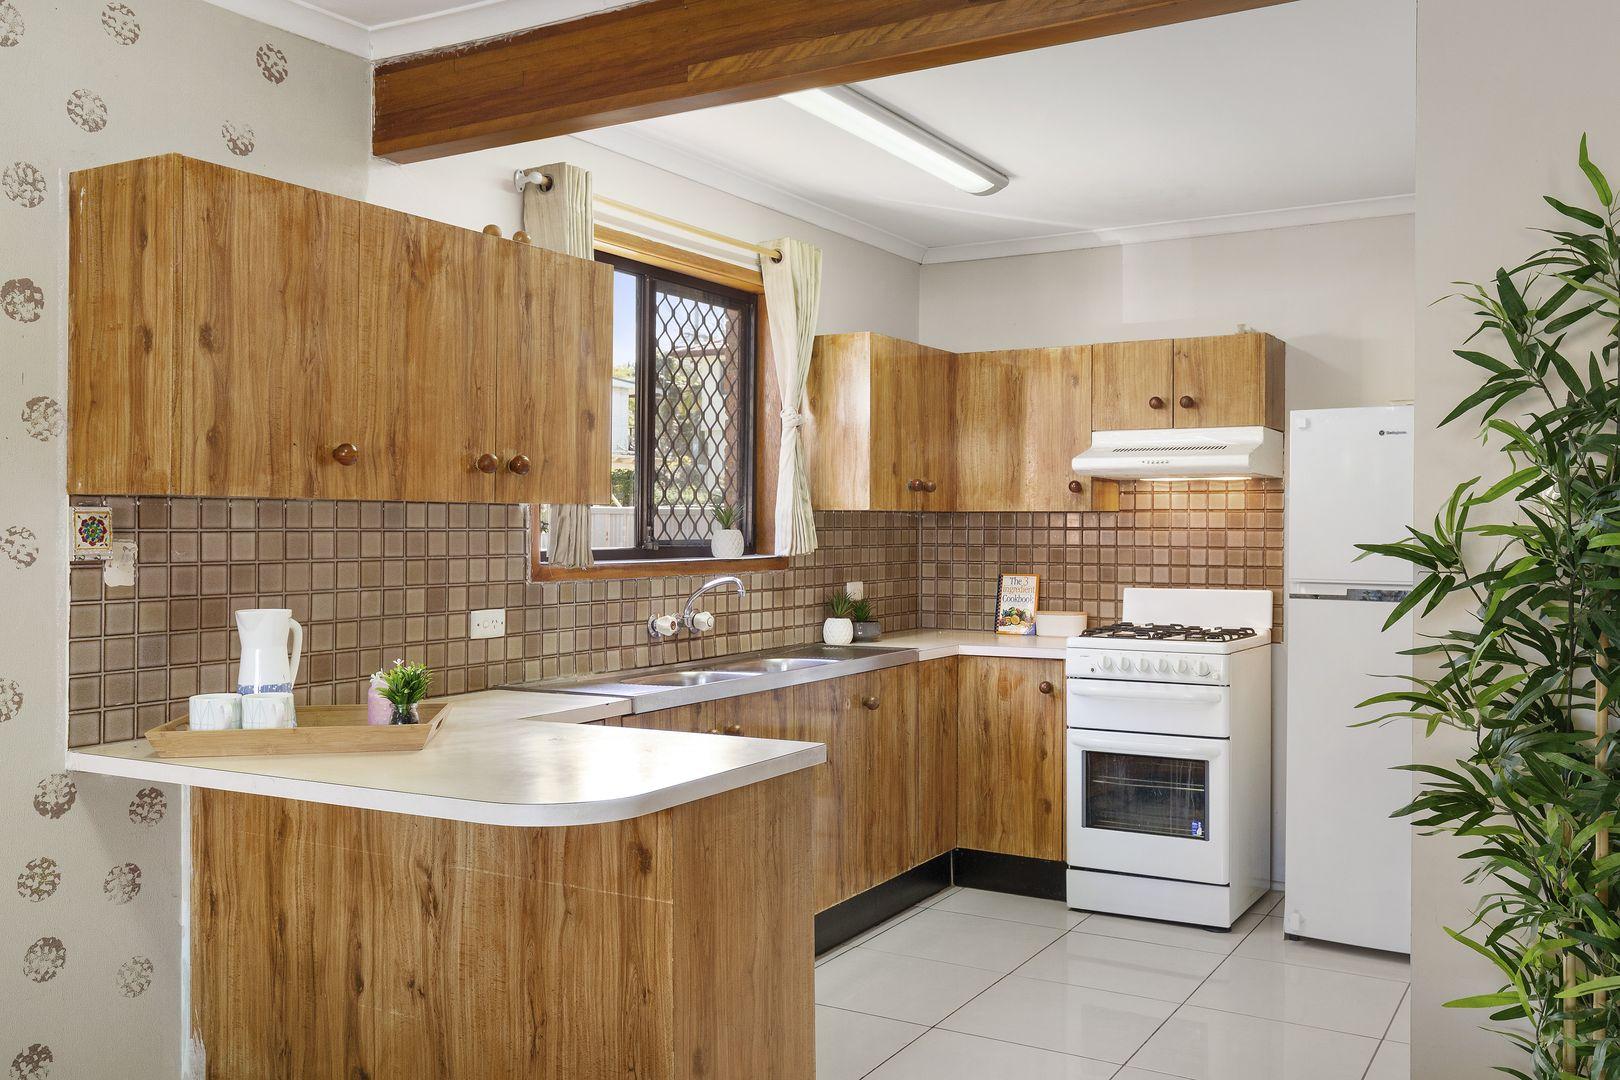 16/22a Kumbari  Street, Rochedale South QLD 4123, Image 1